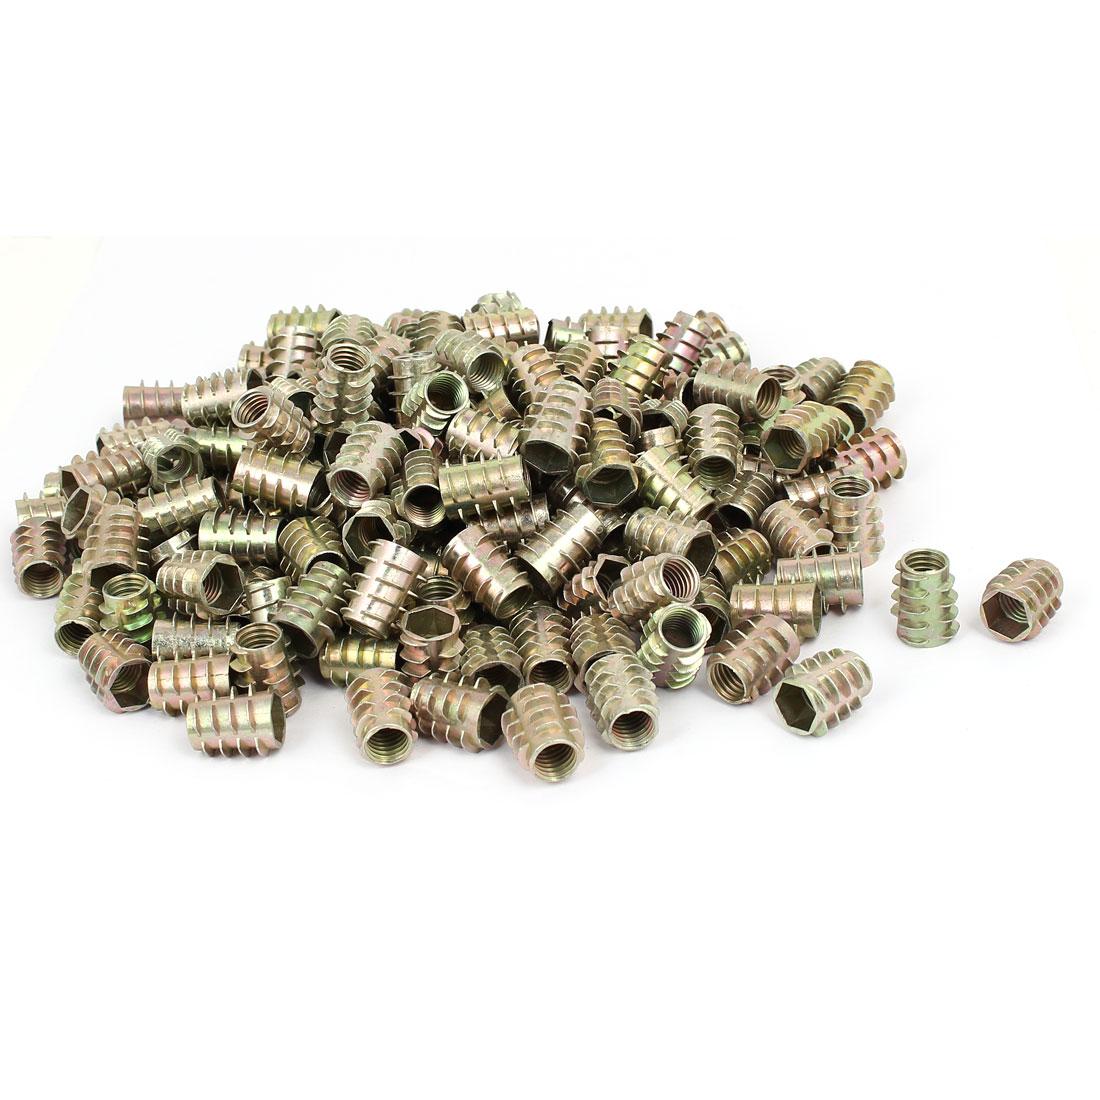 Wood Furniture Zinc Alloy Hex Socket Insert Screws E-Nuts M10x20mm 200pcs